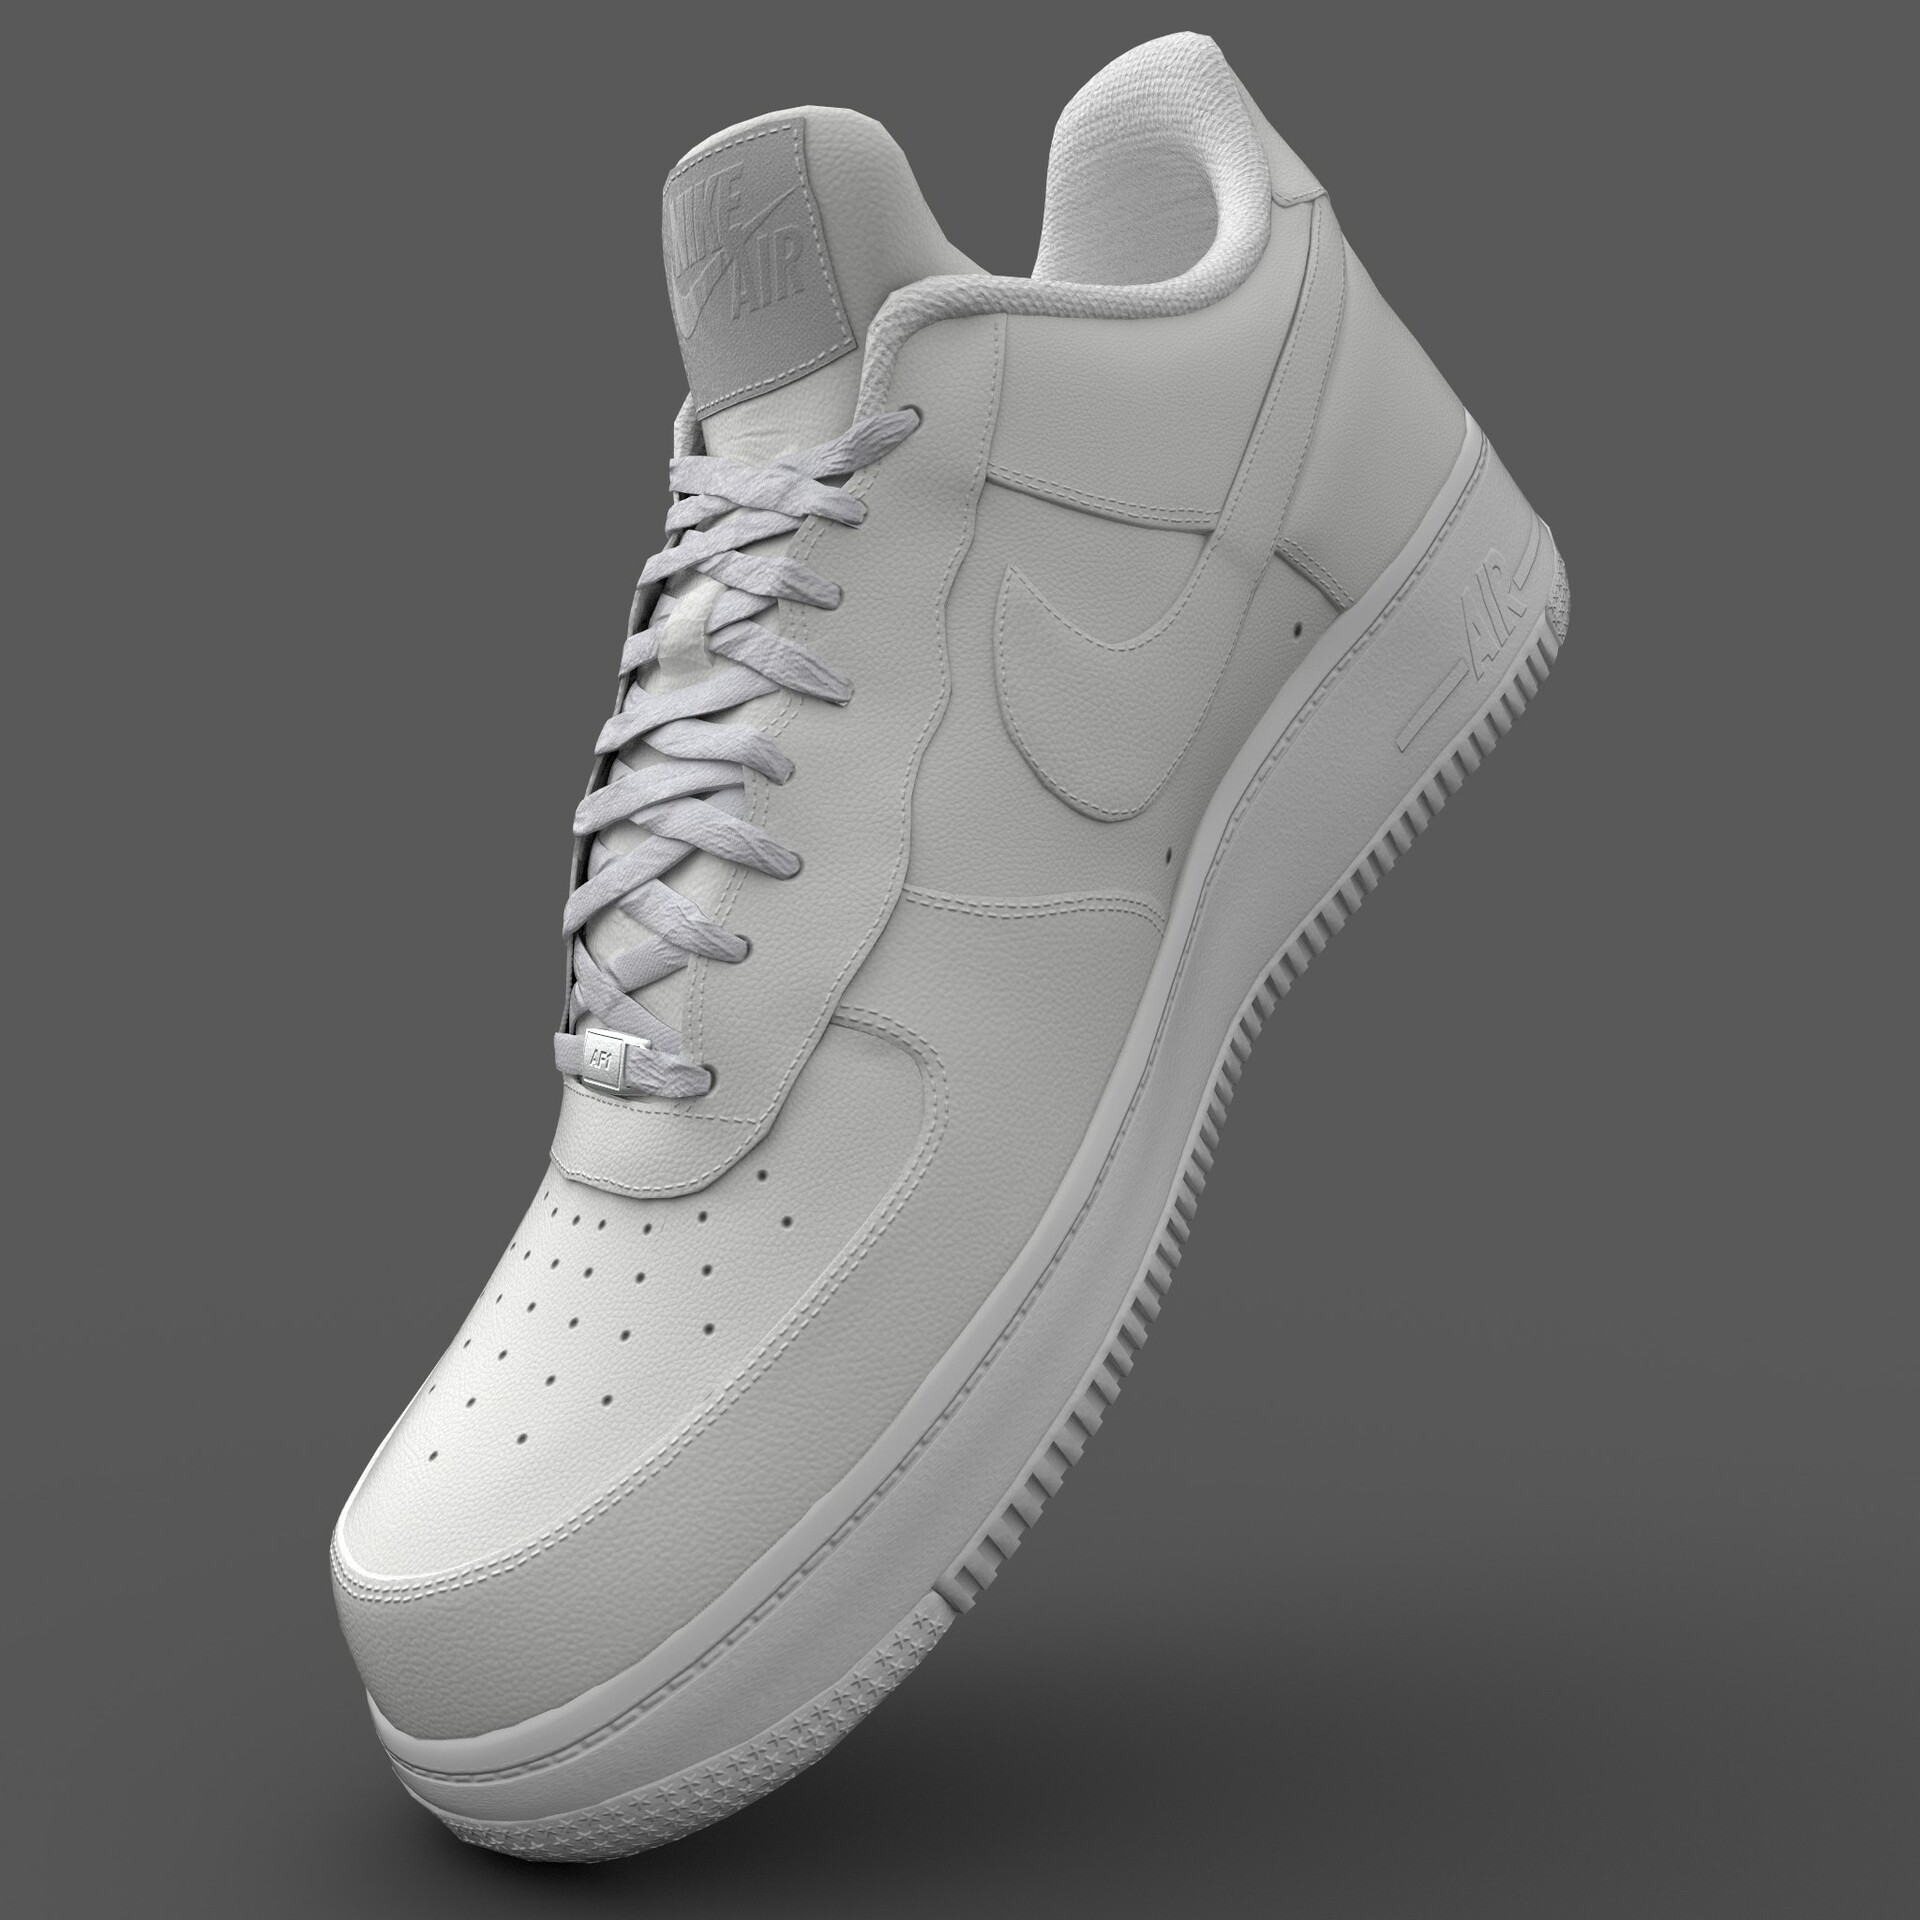 Nike Air Force 1 Real Time, Joshua Farmer